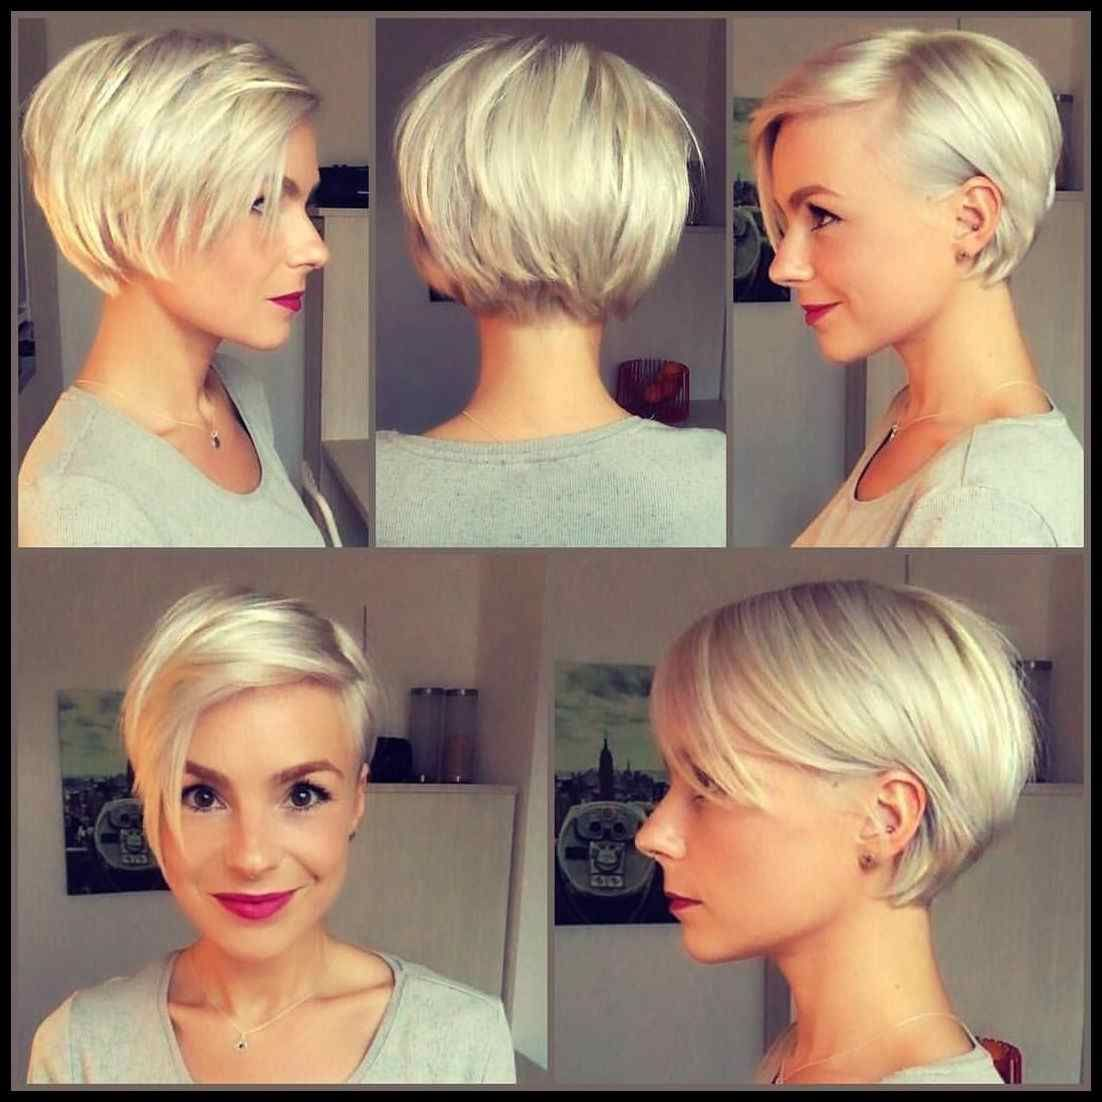 22 Fantastische Bild Of Ubergang Frisuren Von Kurz Auf Lang Frisuren Tutorials Haarschnitt Damen Haarschnitt Kurz Pixie Haarschnitt